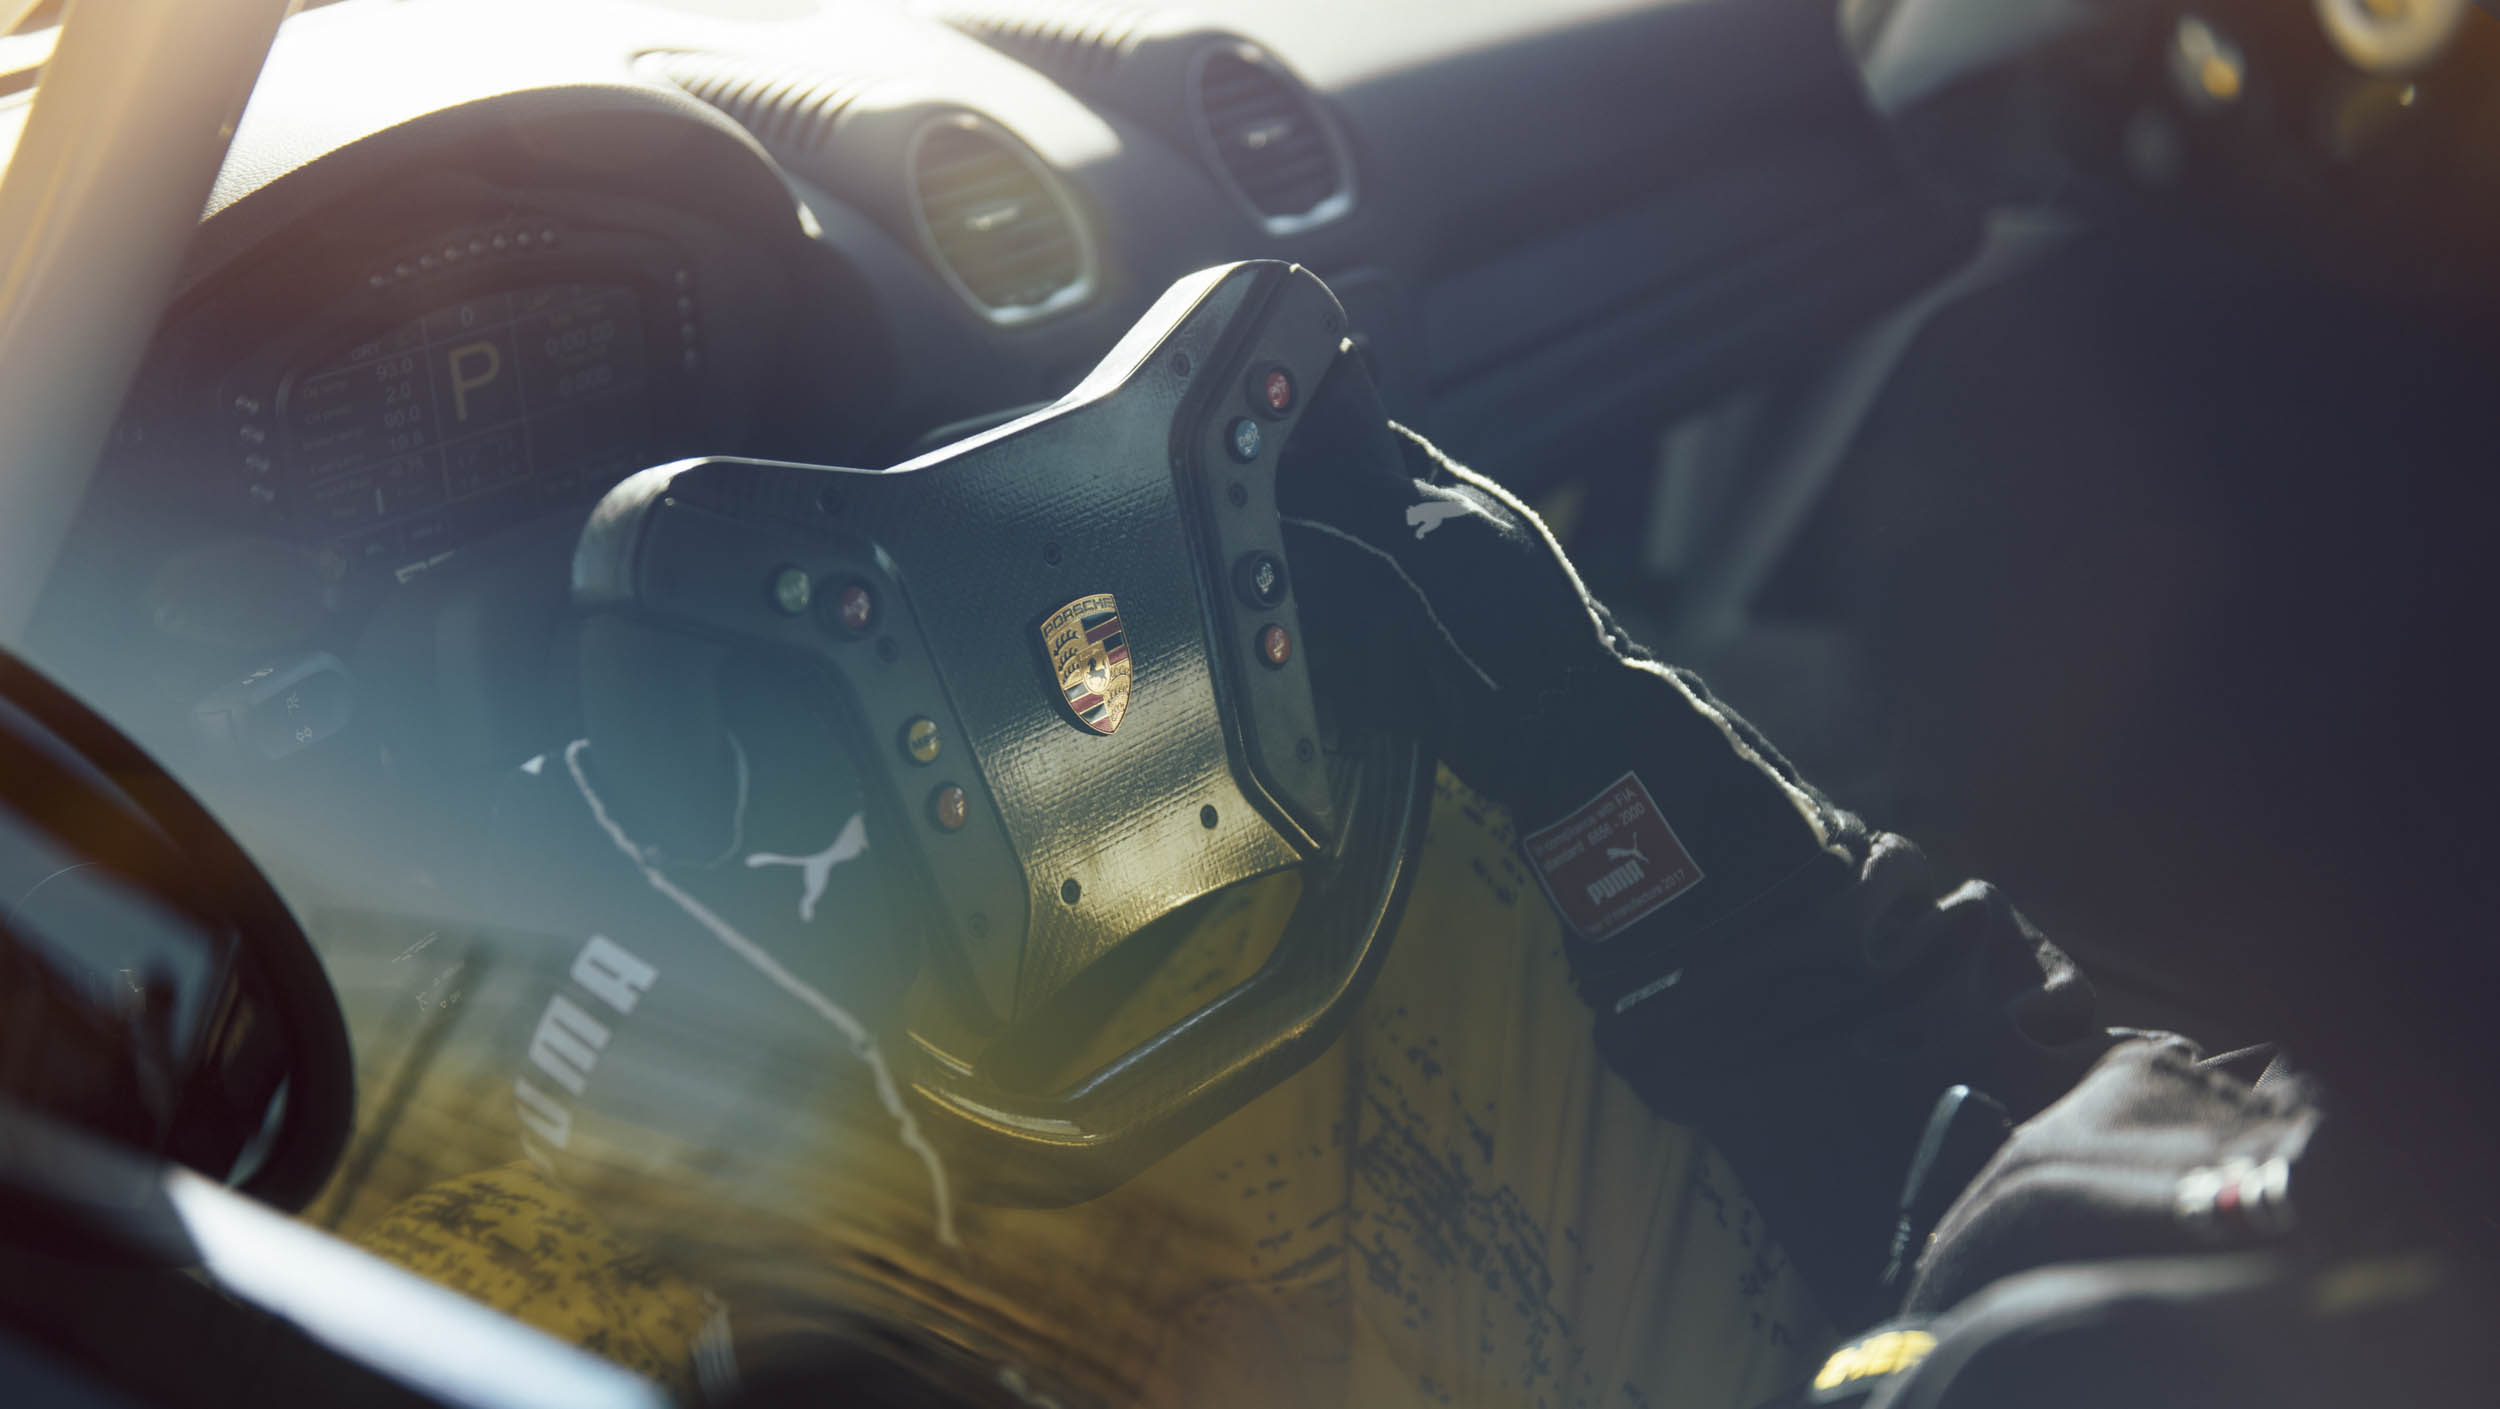 2019 Porsche 718 Cayman GT4 Clubsport steering wheel